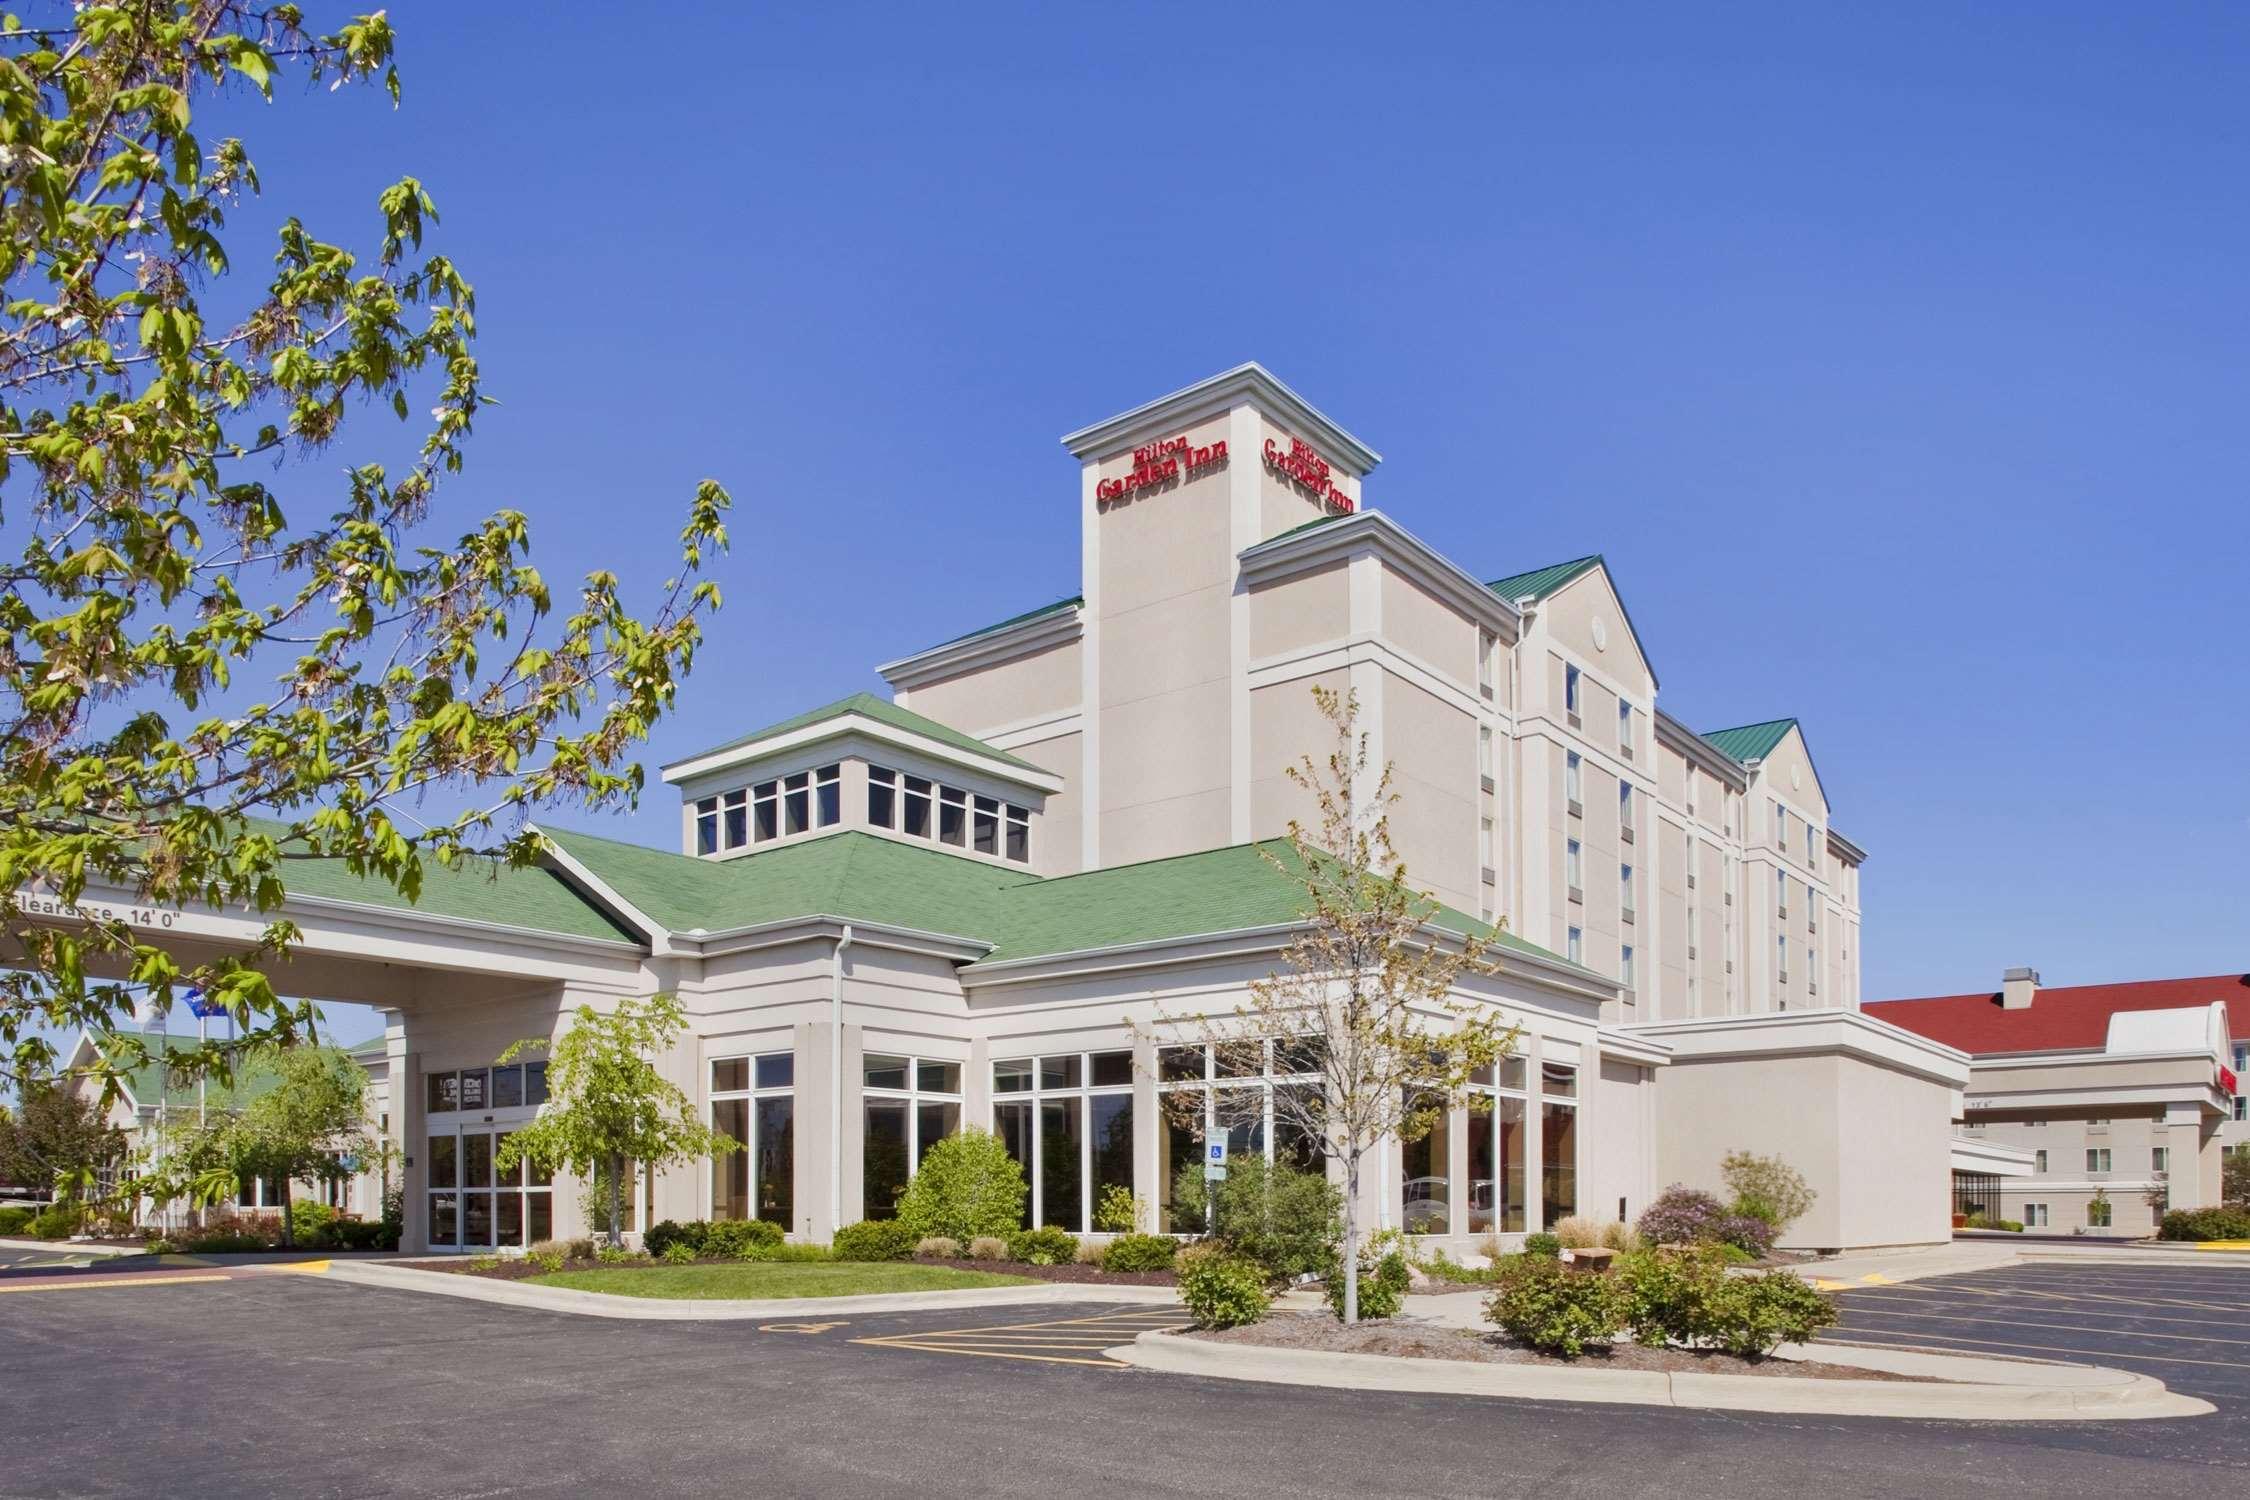 Hilton Garden Inn Champaign/ Urbana image 4